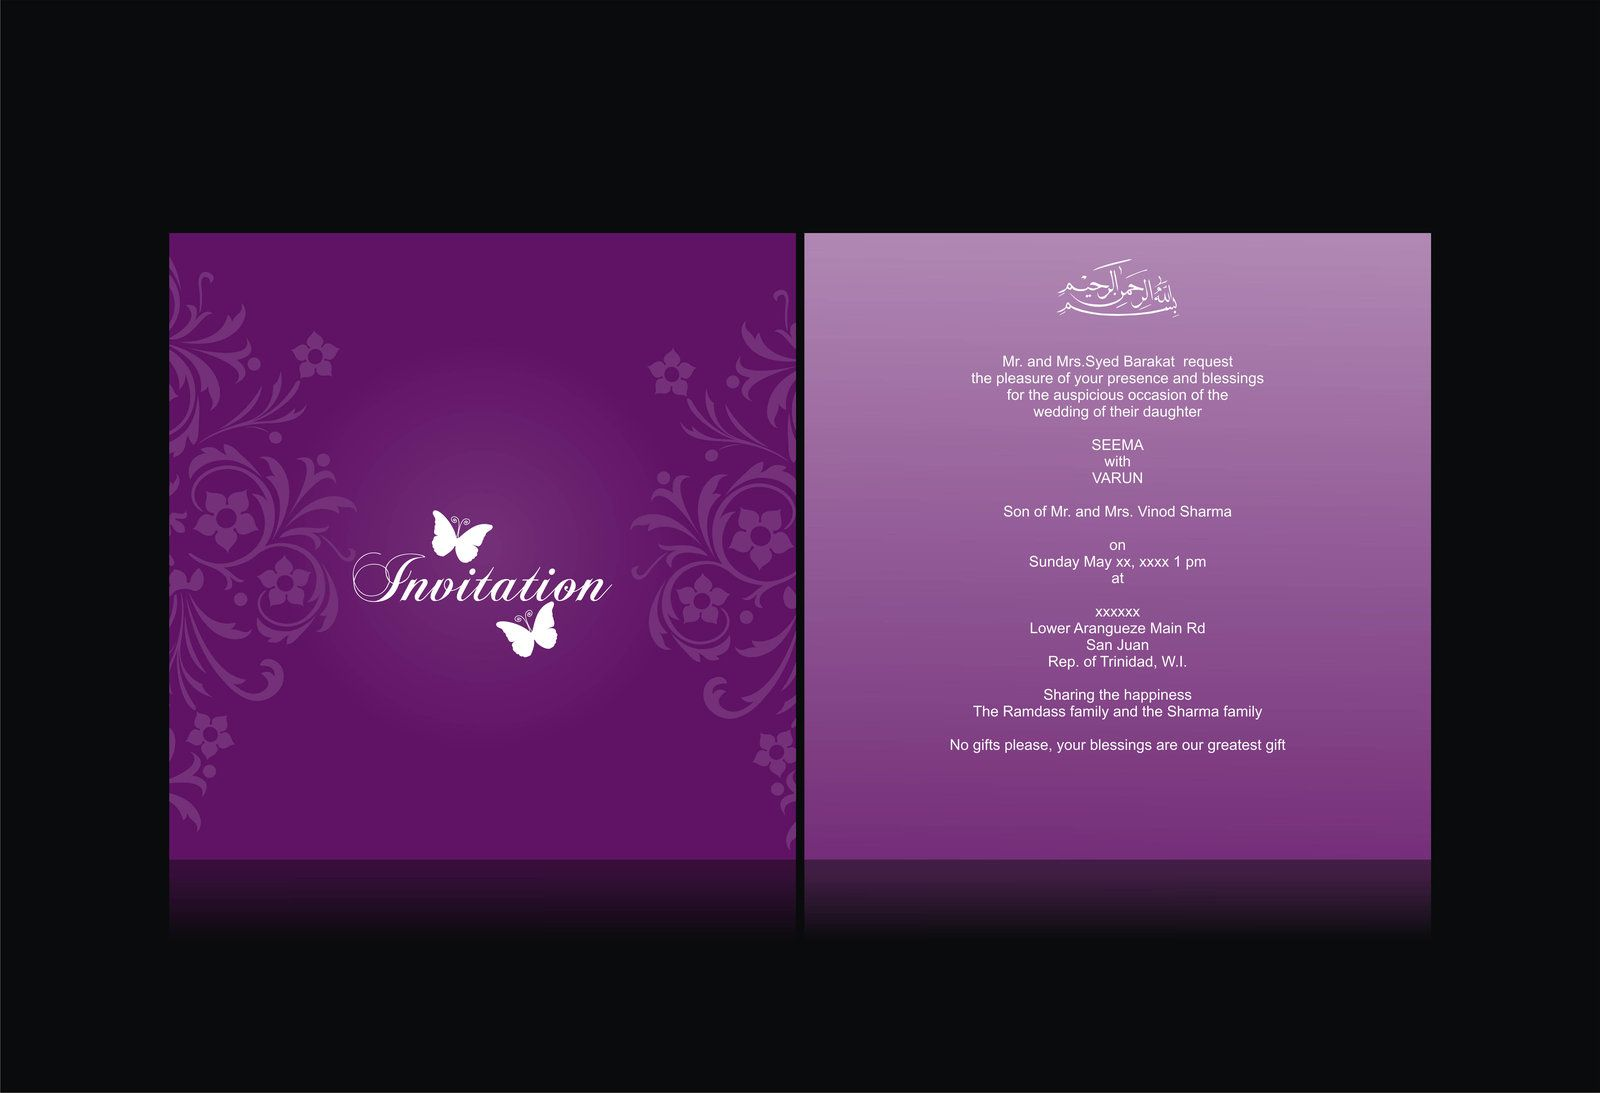 wedding invitation for friends india%0A Wedding invitations